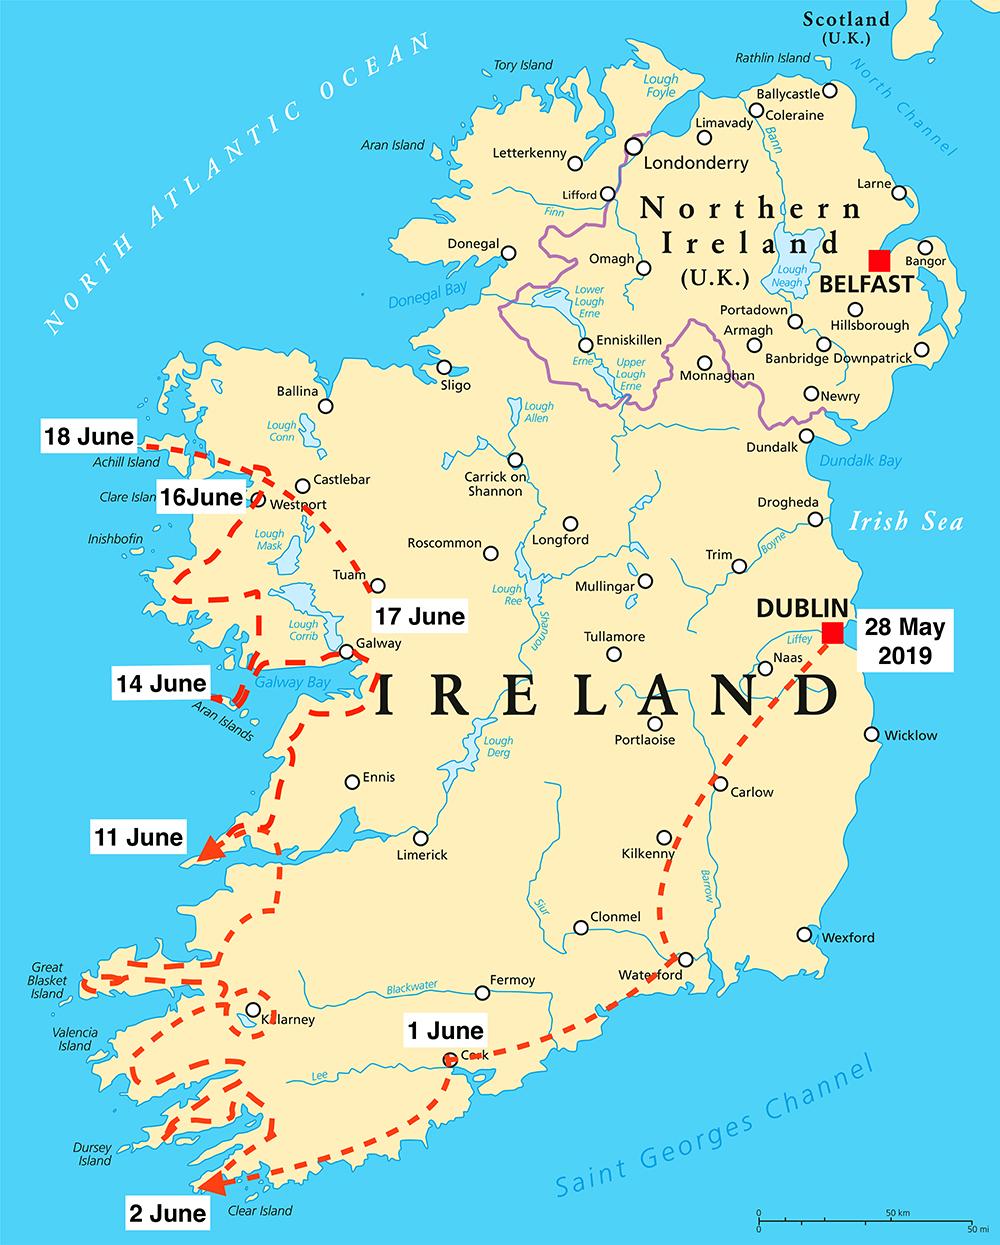 Brendan McGill - his Irish Odyssey week 3